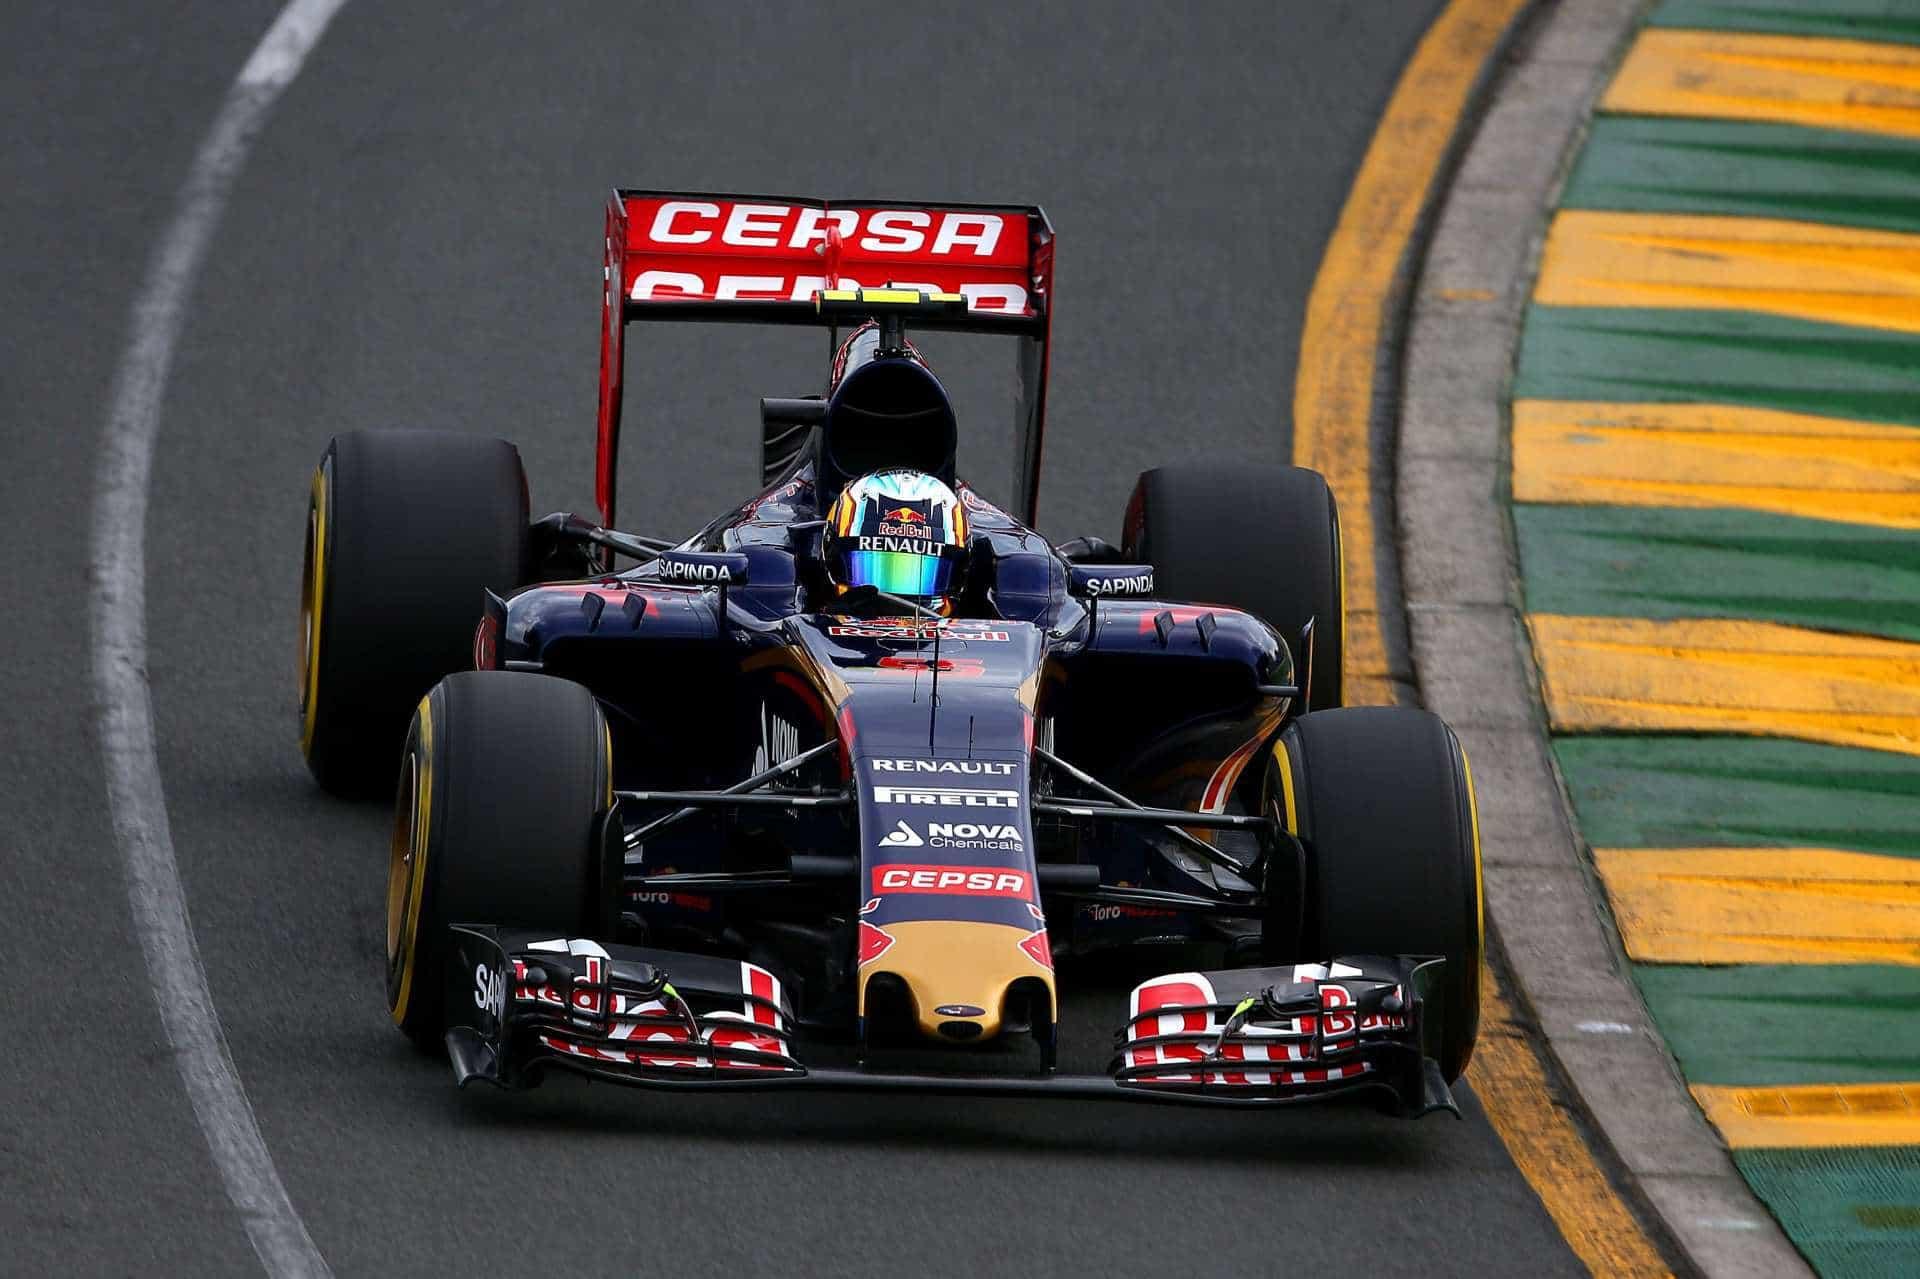 Sainz Toro Rosso Australian GP F1 2015 Photo Red Bull